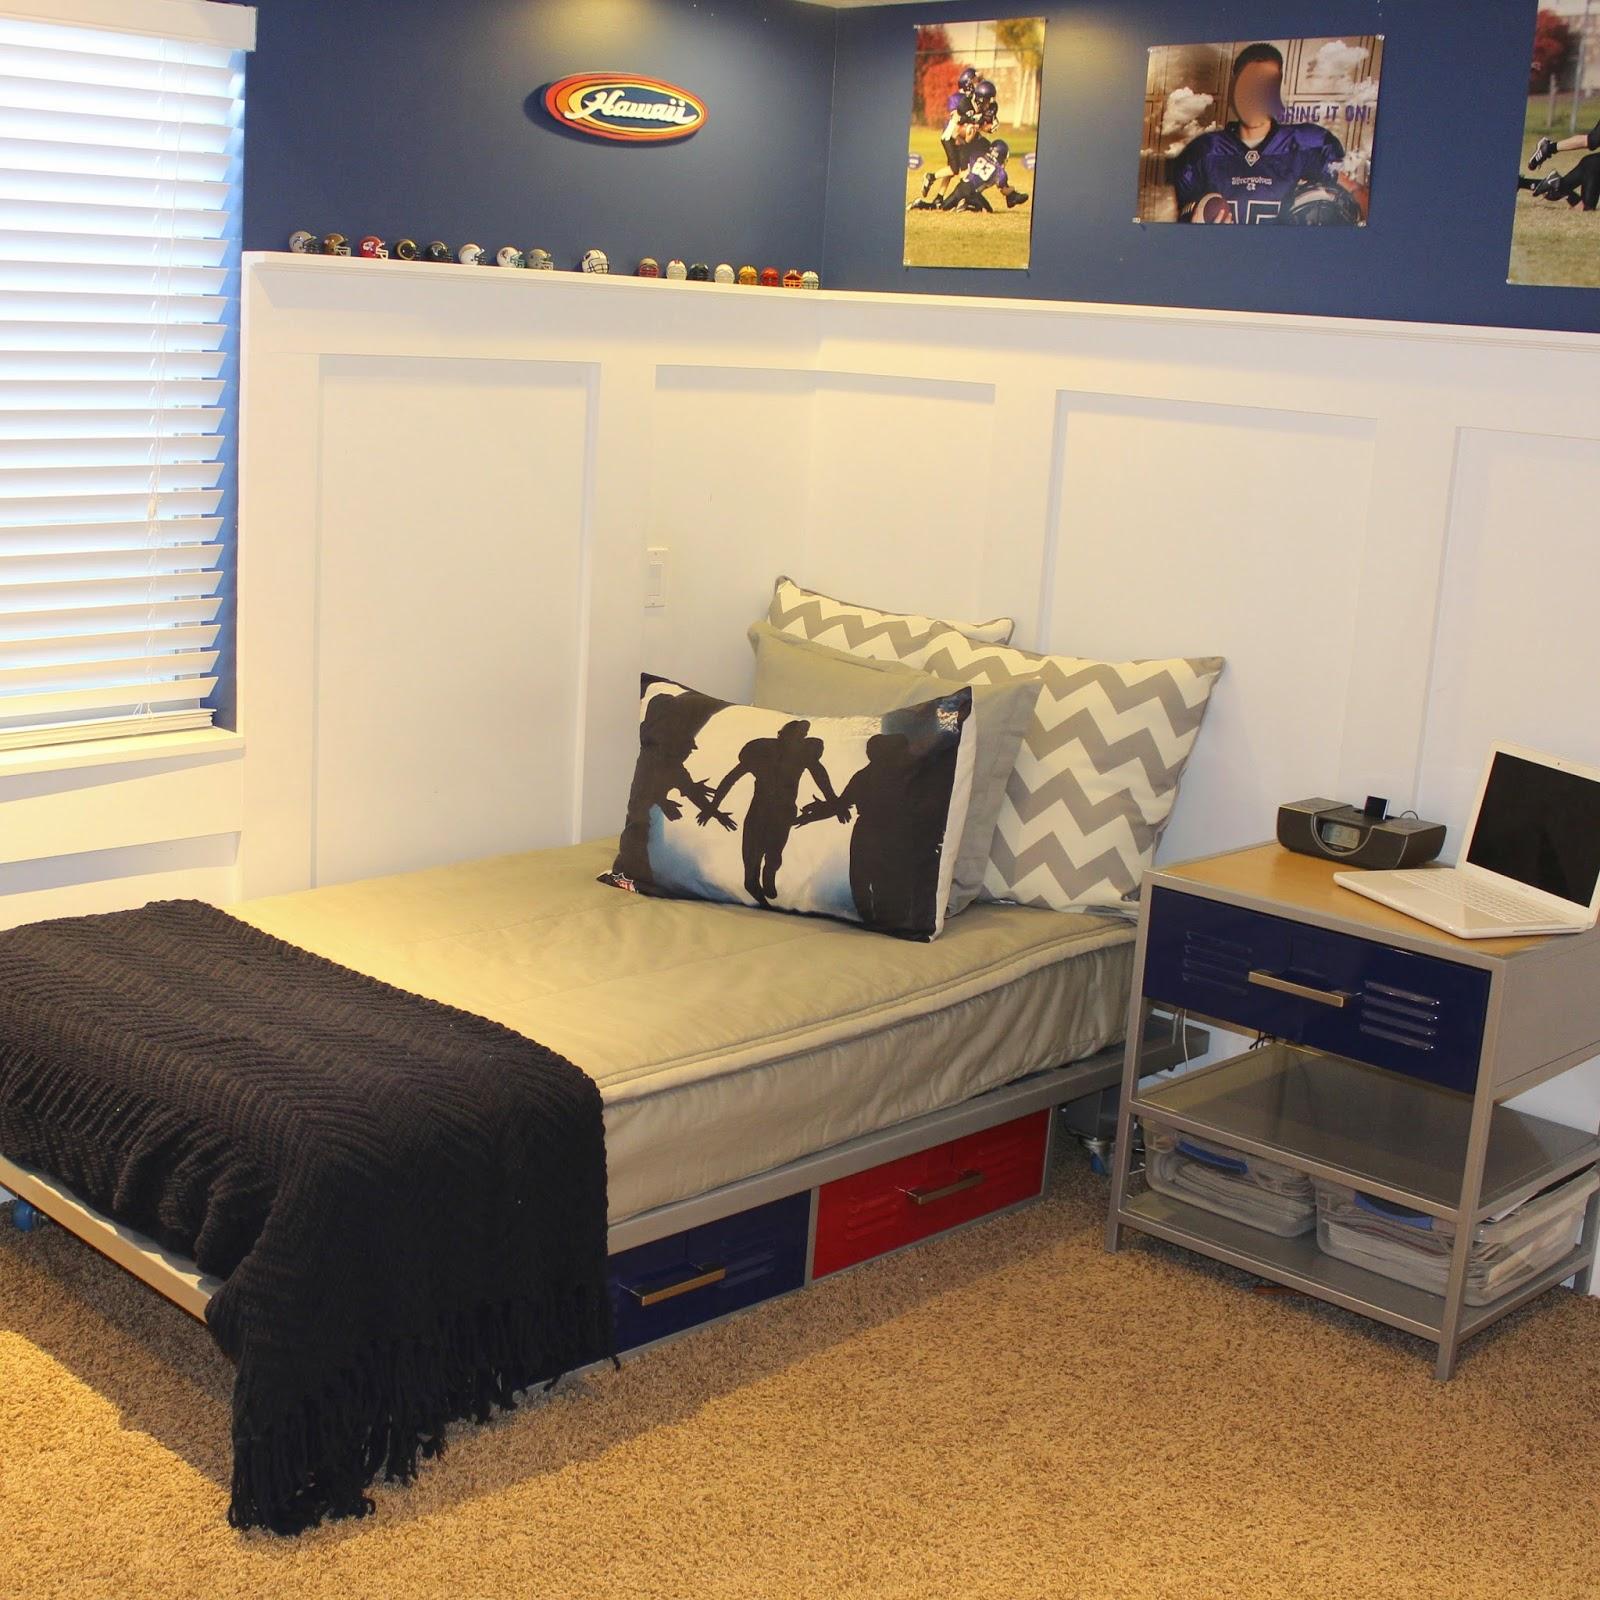 BEDDY'S (bed.ease): Boys, Boys, Boys!